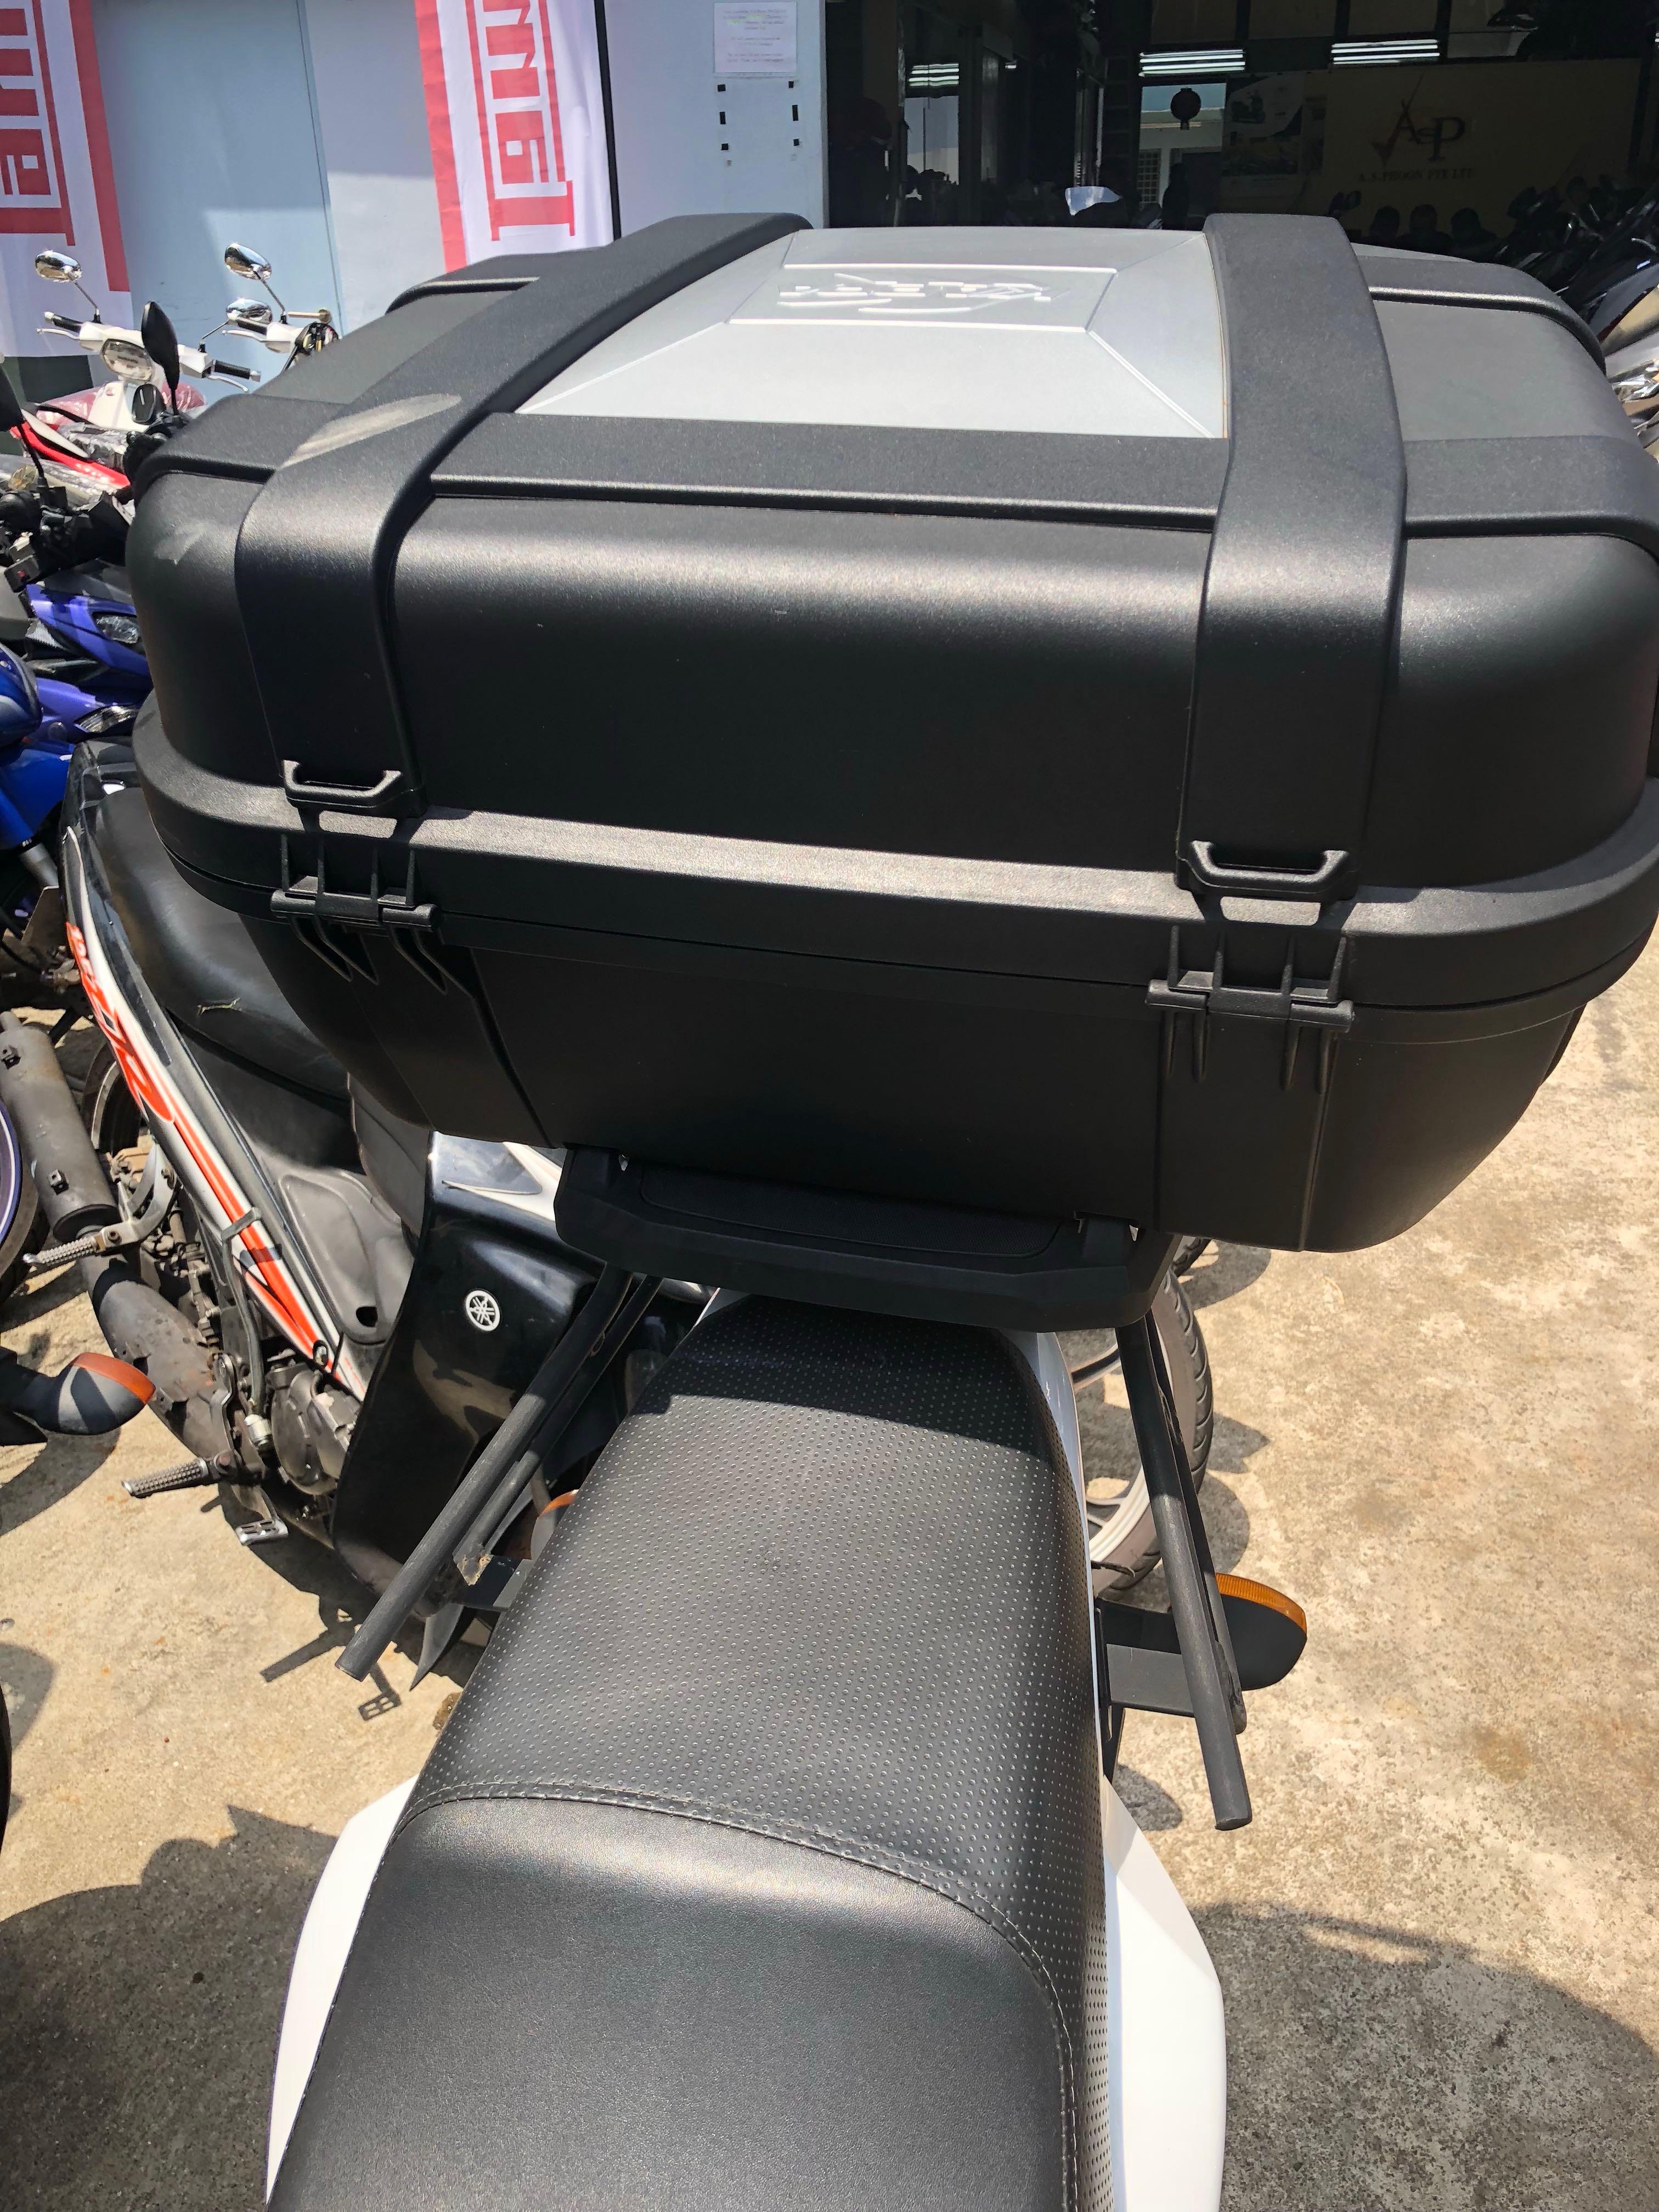 b44c47a158 Kappa KGR52 Garda, Motorbikes, Motorbike Accessories on Carousell